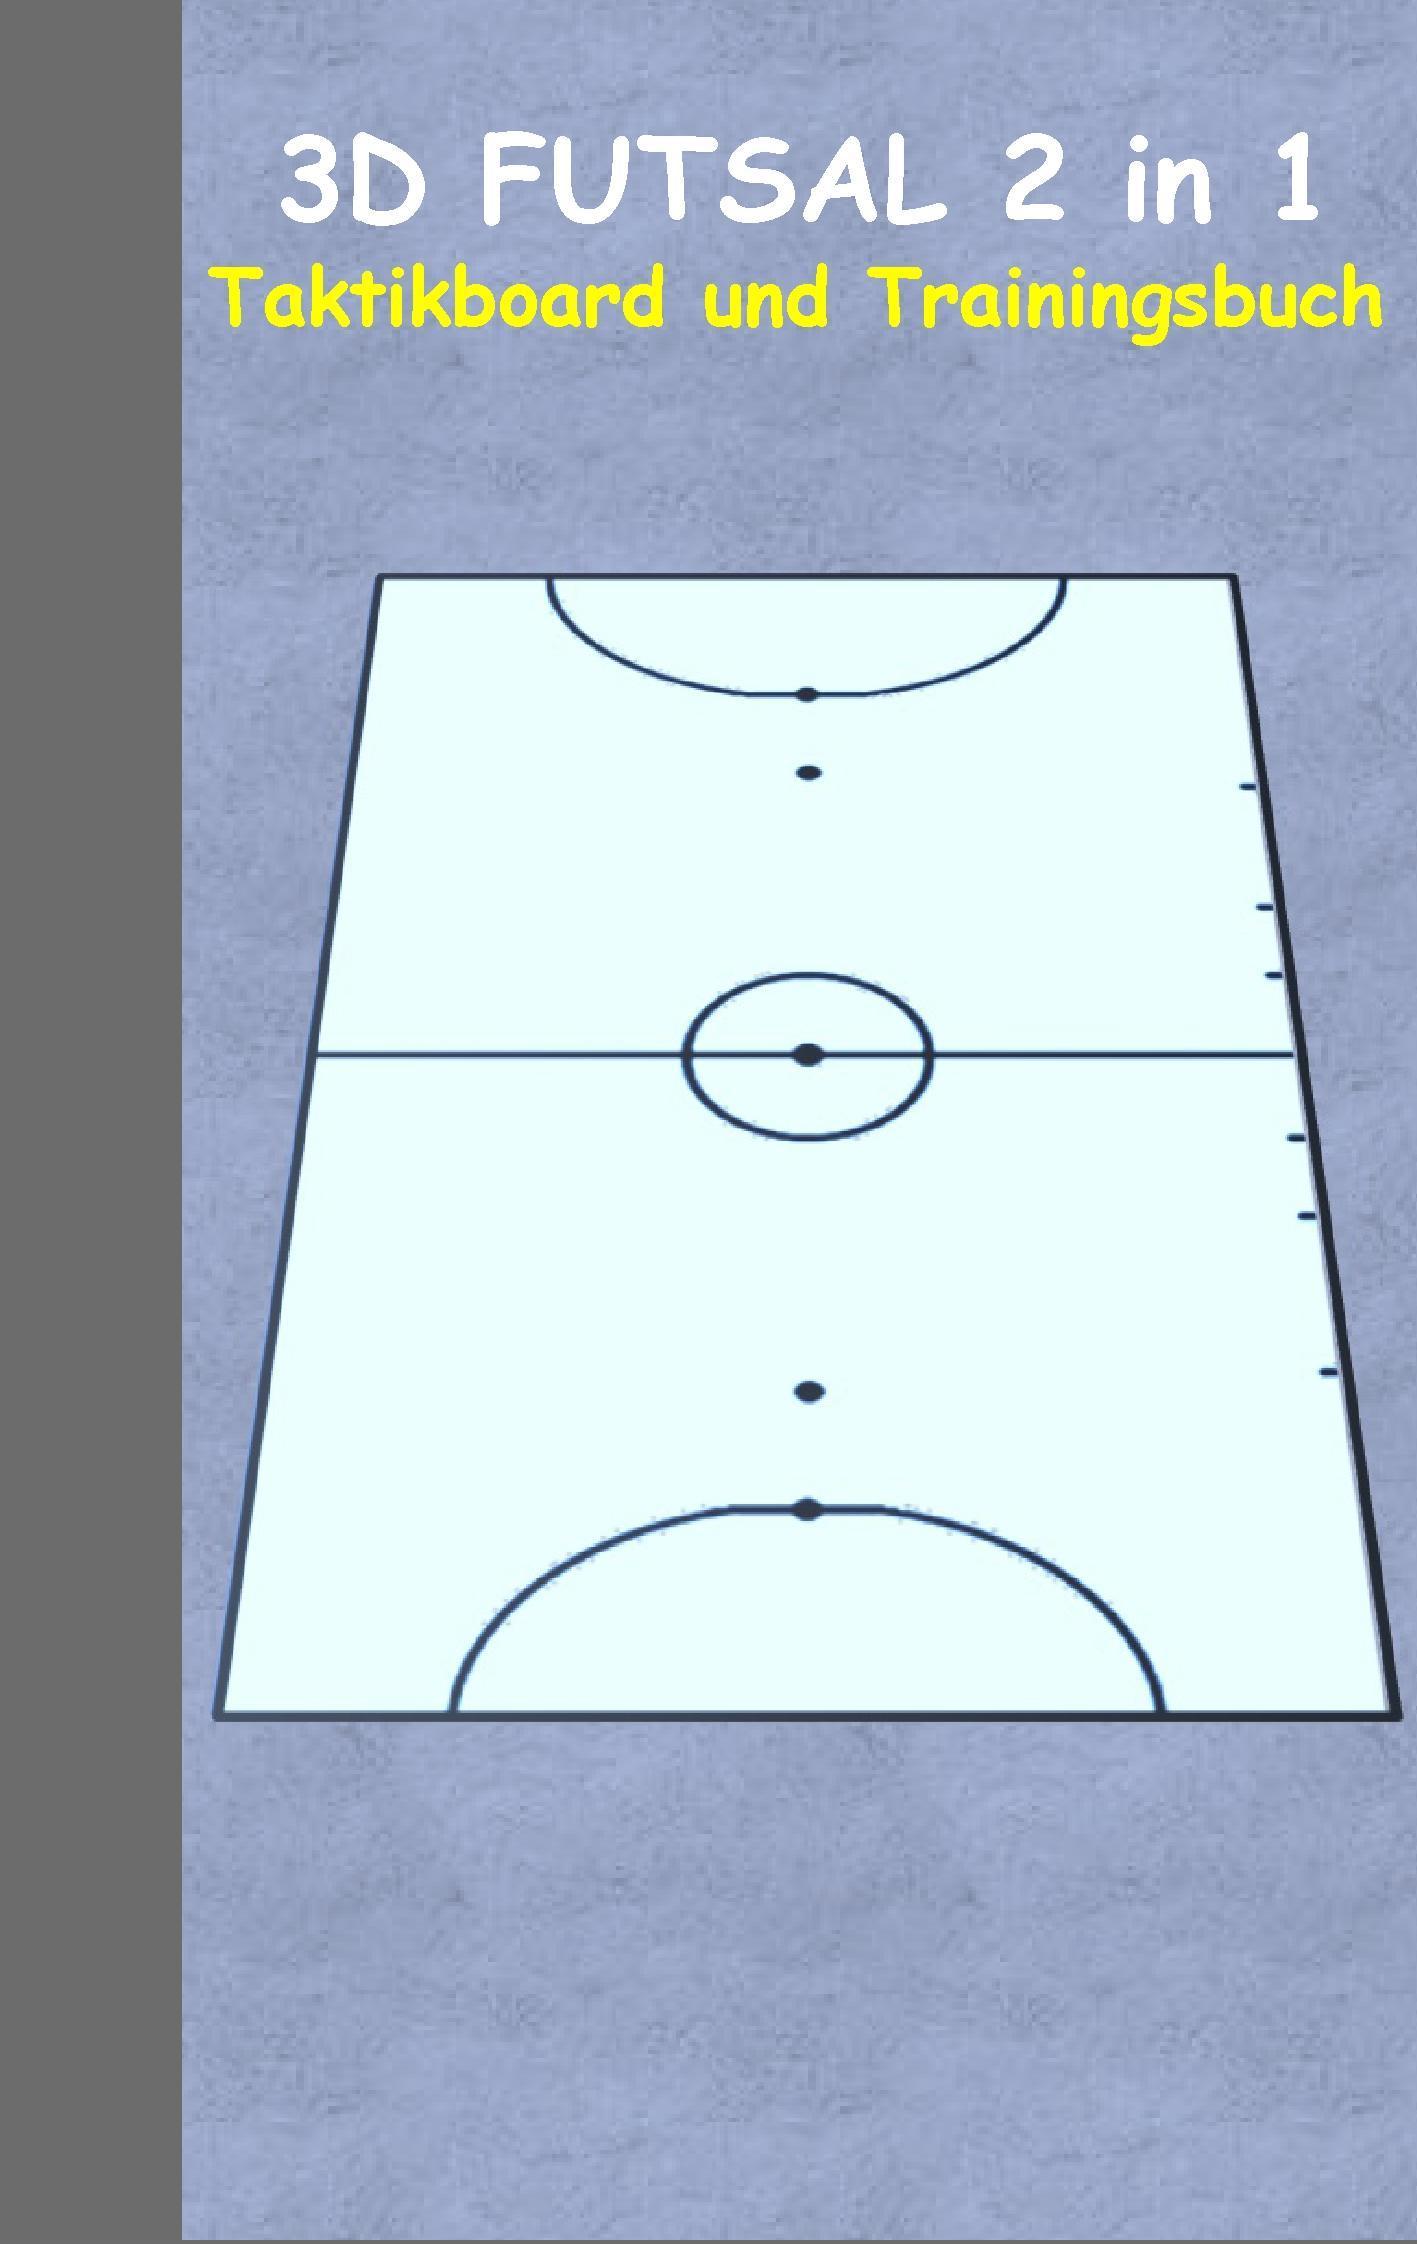 Futsal: 2 in 1 Notiz- und Taktikblock im Pocketformat (Postkarte